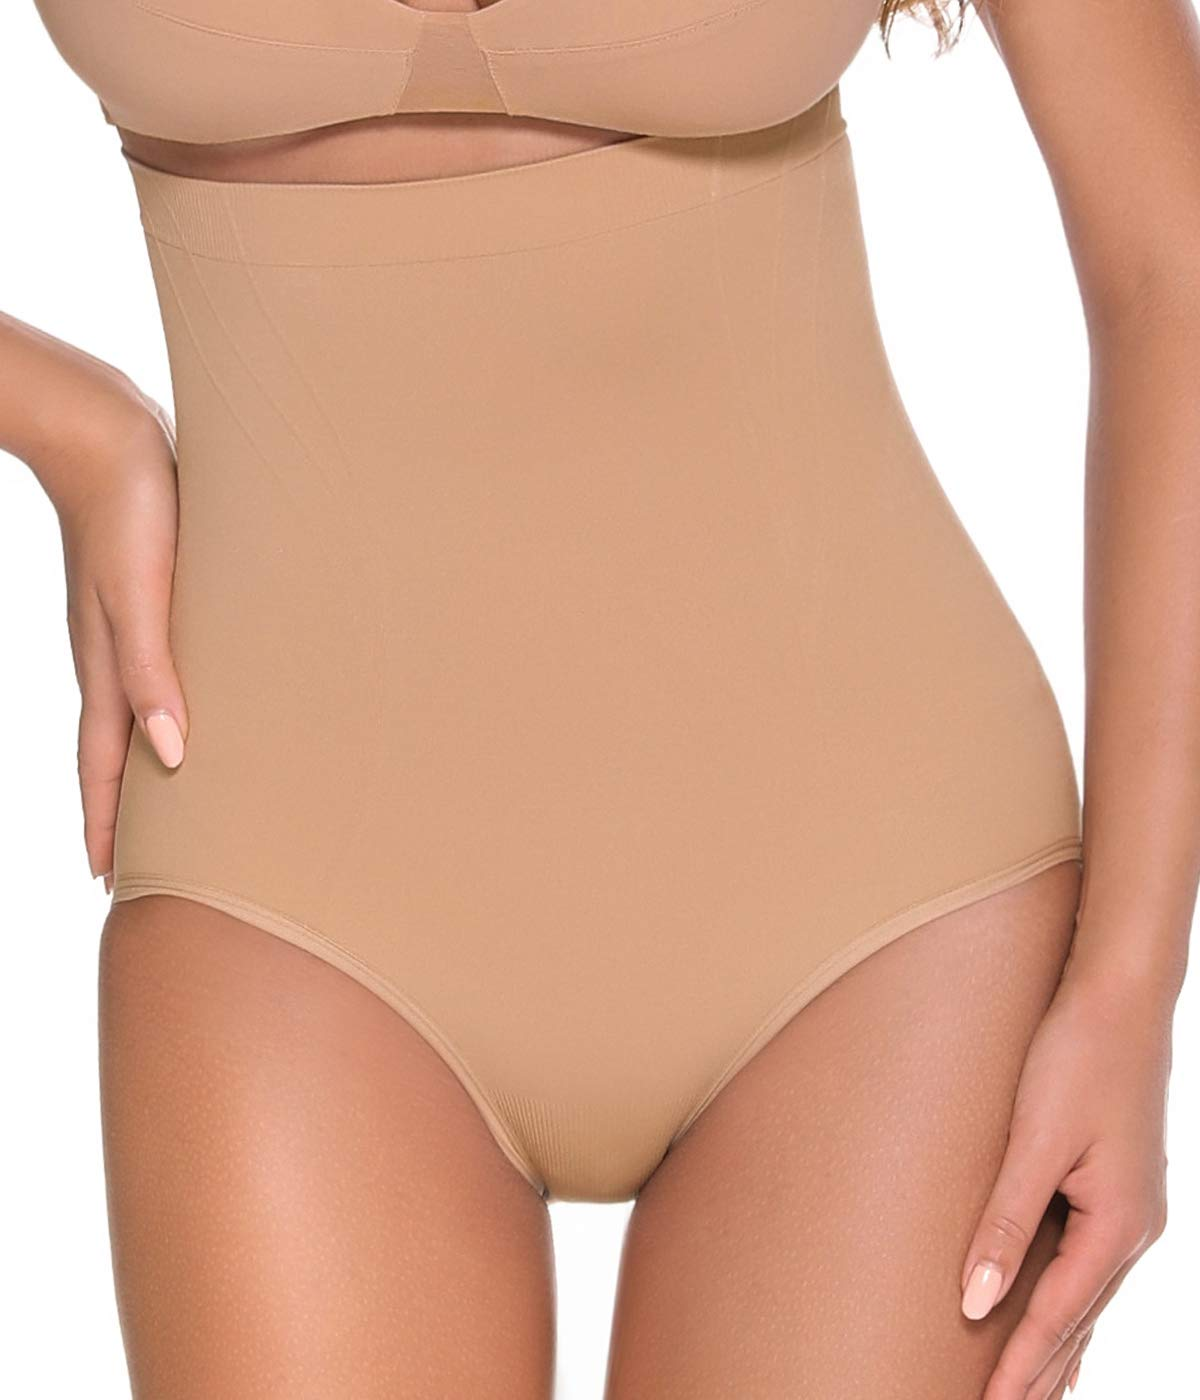 Vaslanda Women High Waist Body Shaper Firm Tummy Control Shapewear Panties Butt Lifter Briefs Seamless Panty Girdle Underwear